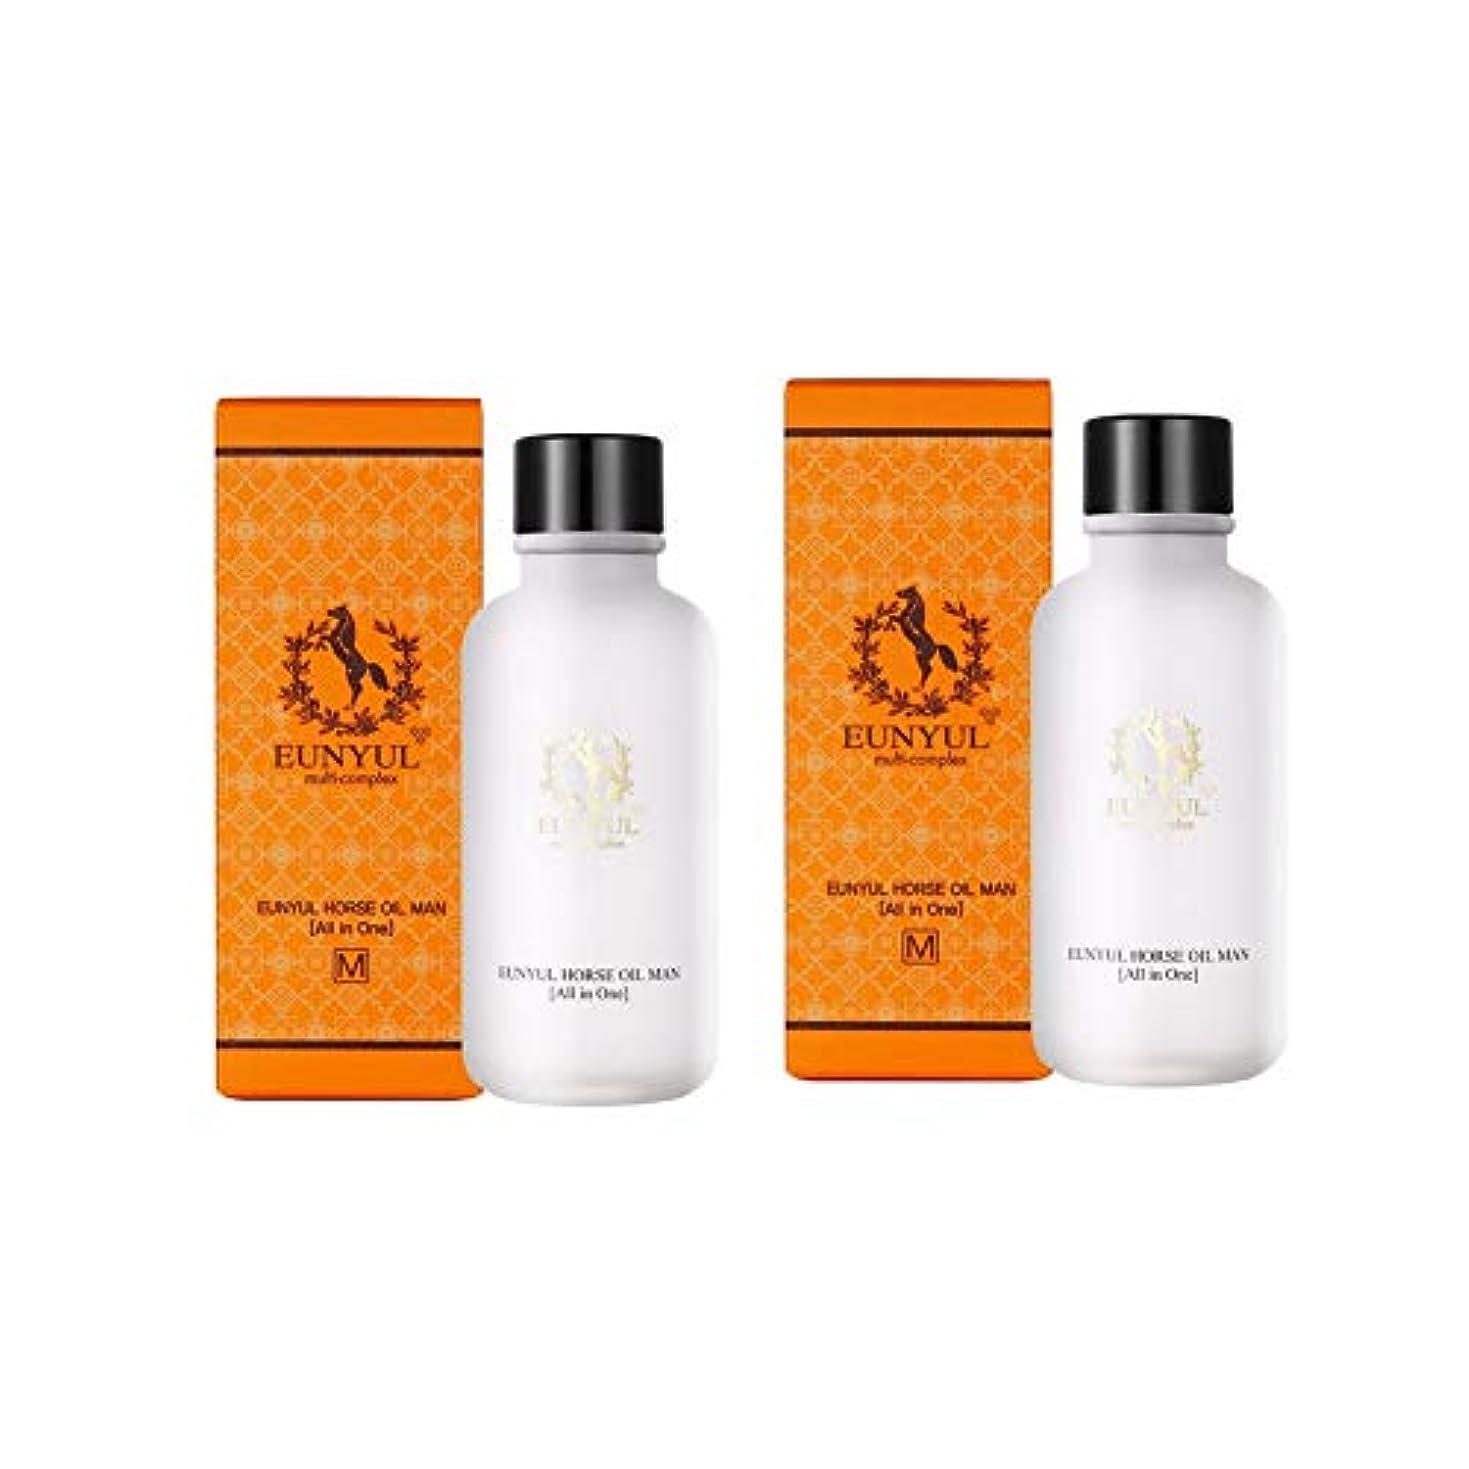 Eunyul馬油オールインワン125mlx2本セットメンズコスメ韓国コスメ、Eunyul Horse Oil All in One 125ml x 2ea Set Men's Cosmetics Korean Cosmetics...